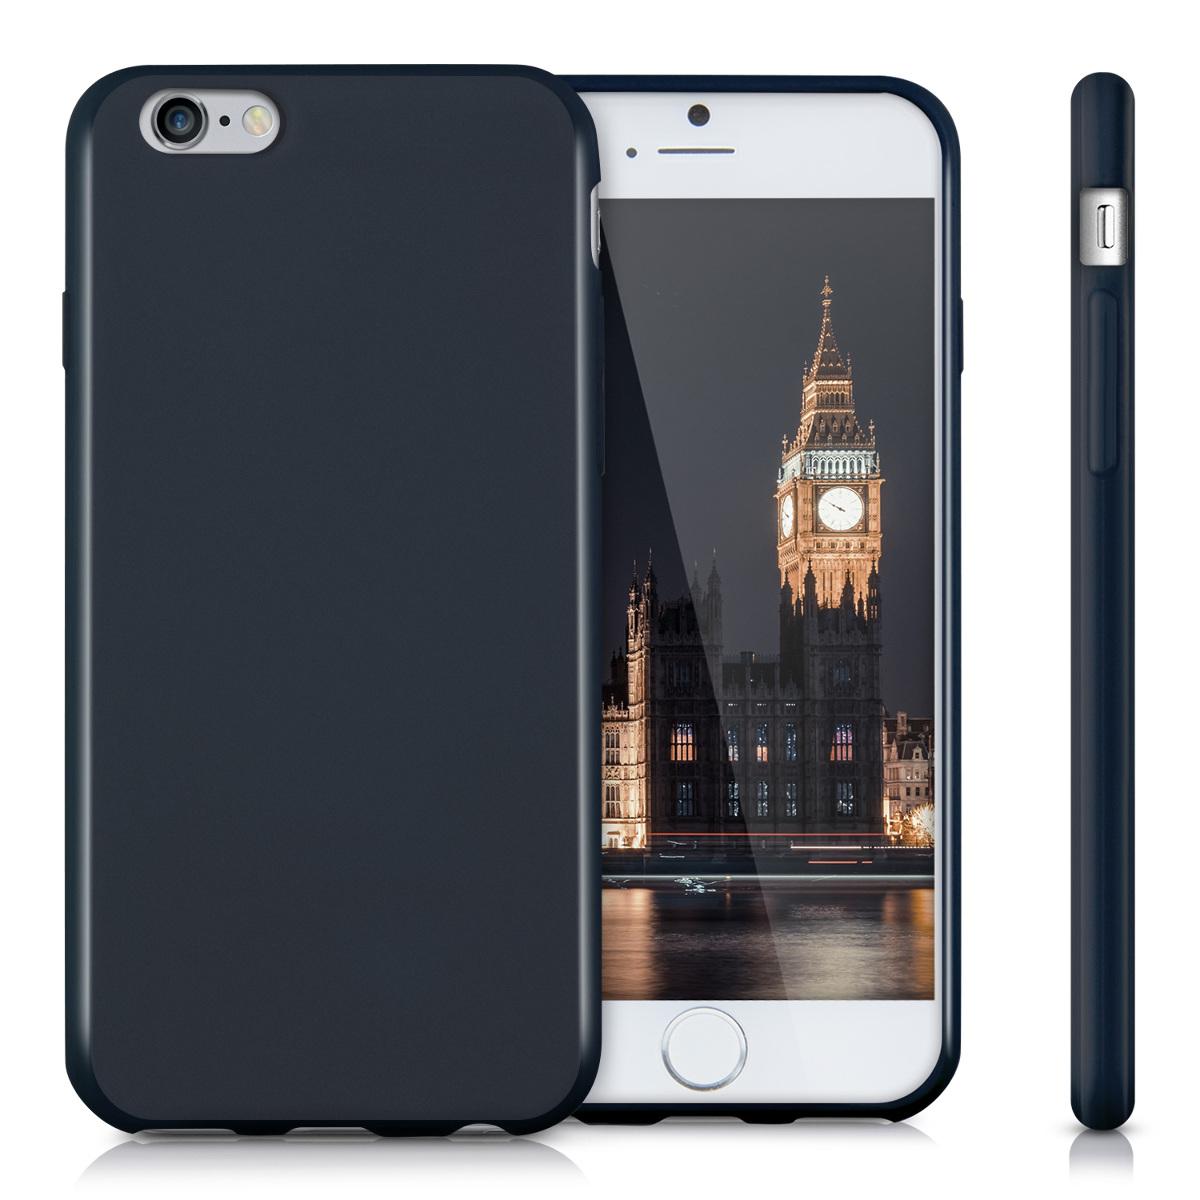 amazon iphone 4 hülle silikon